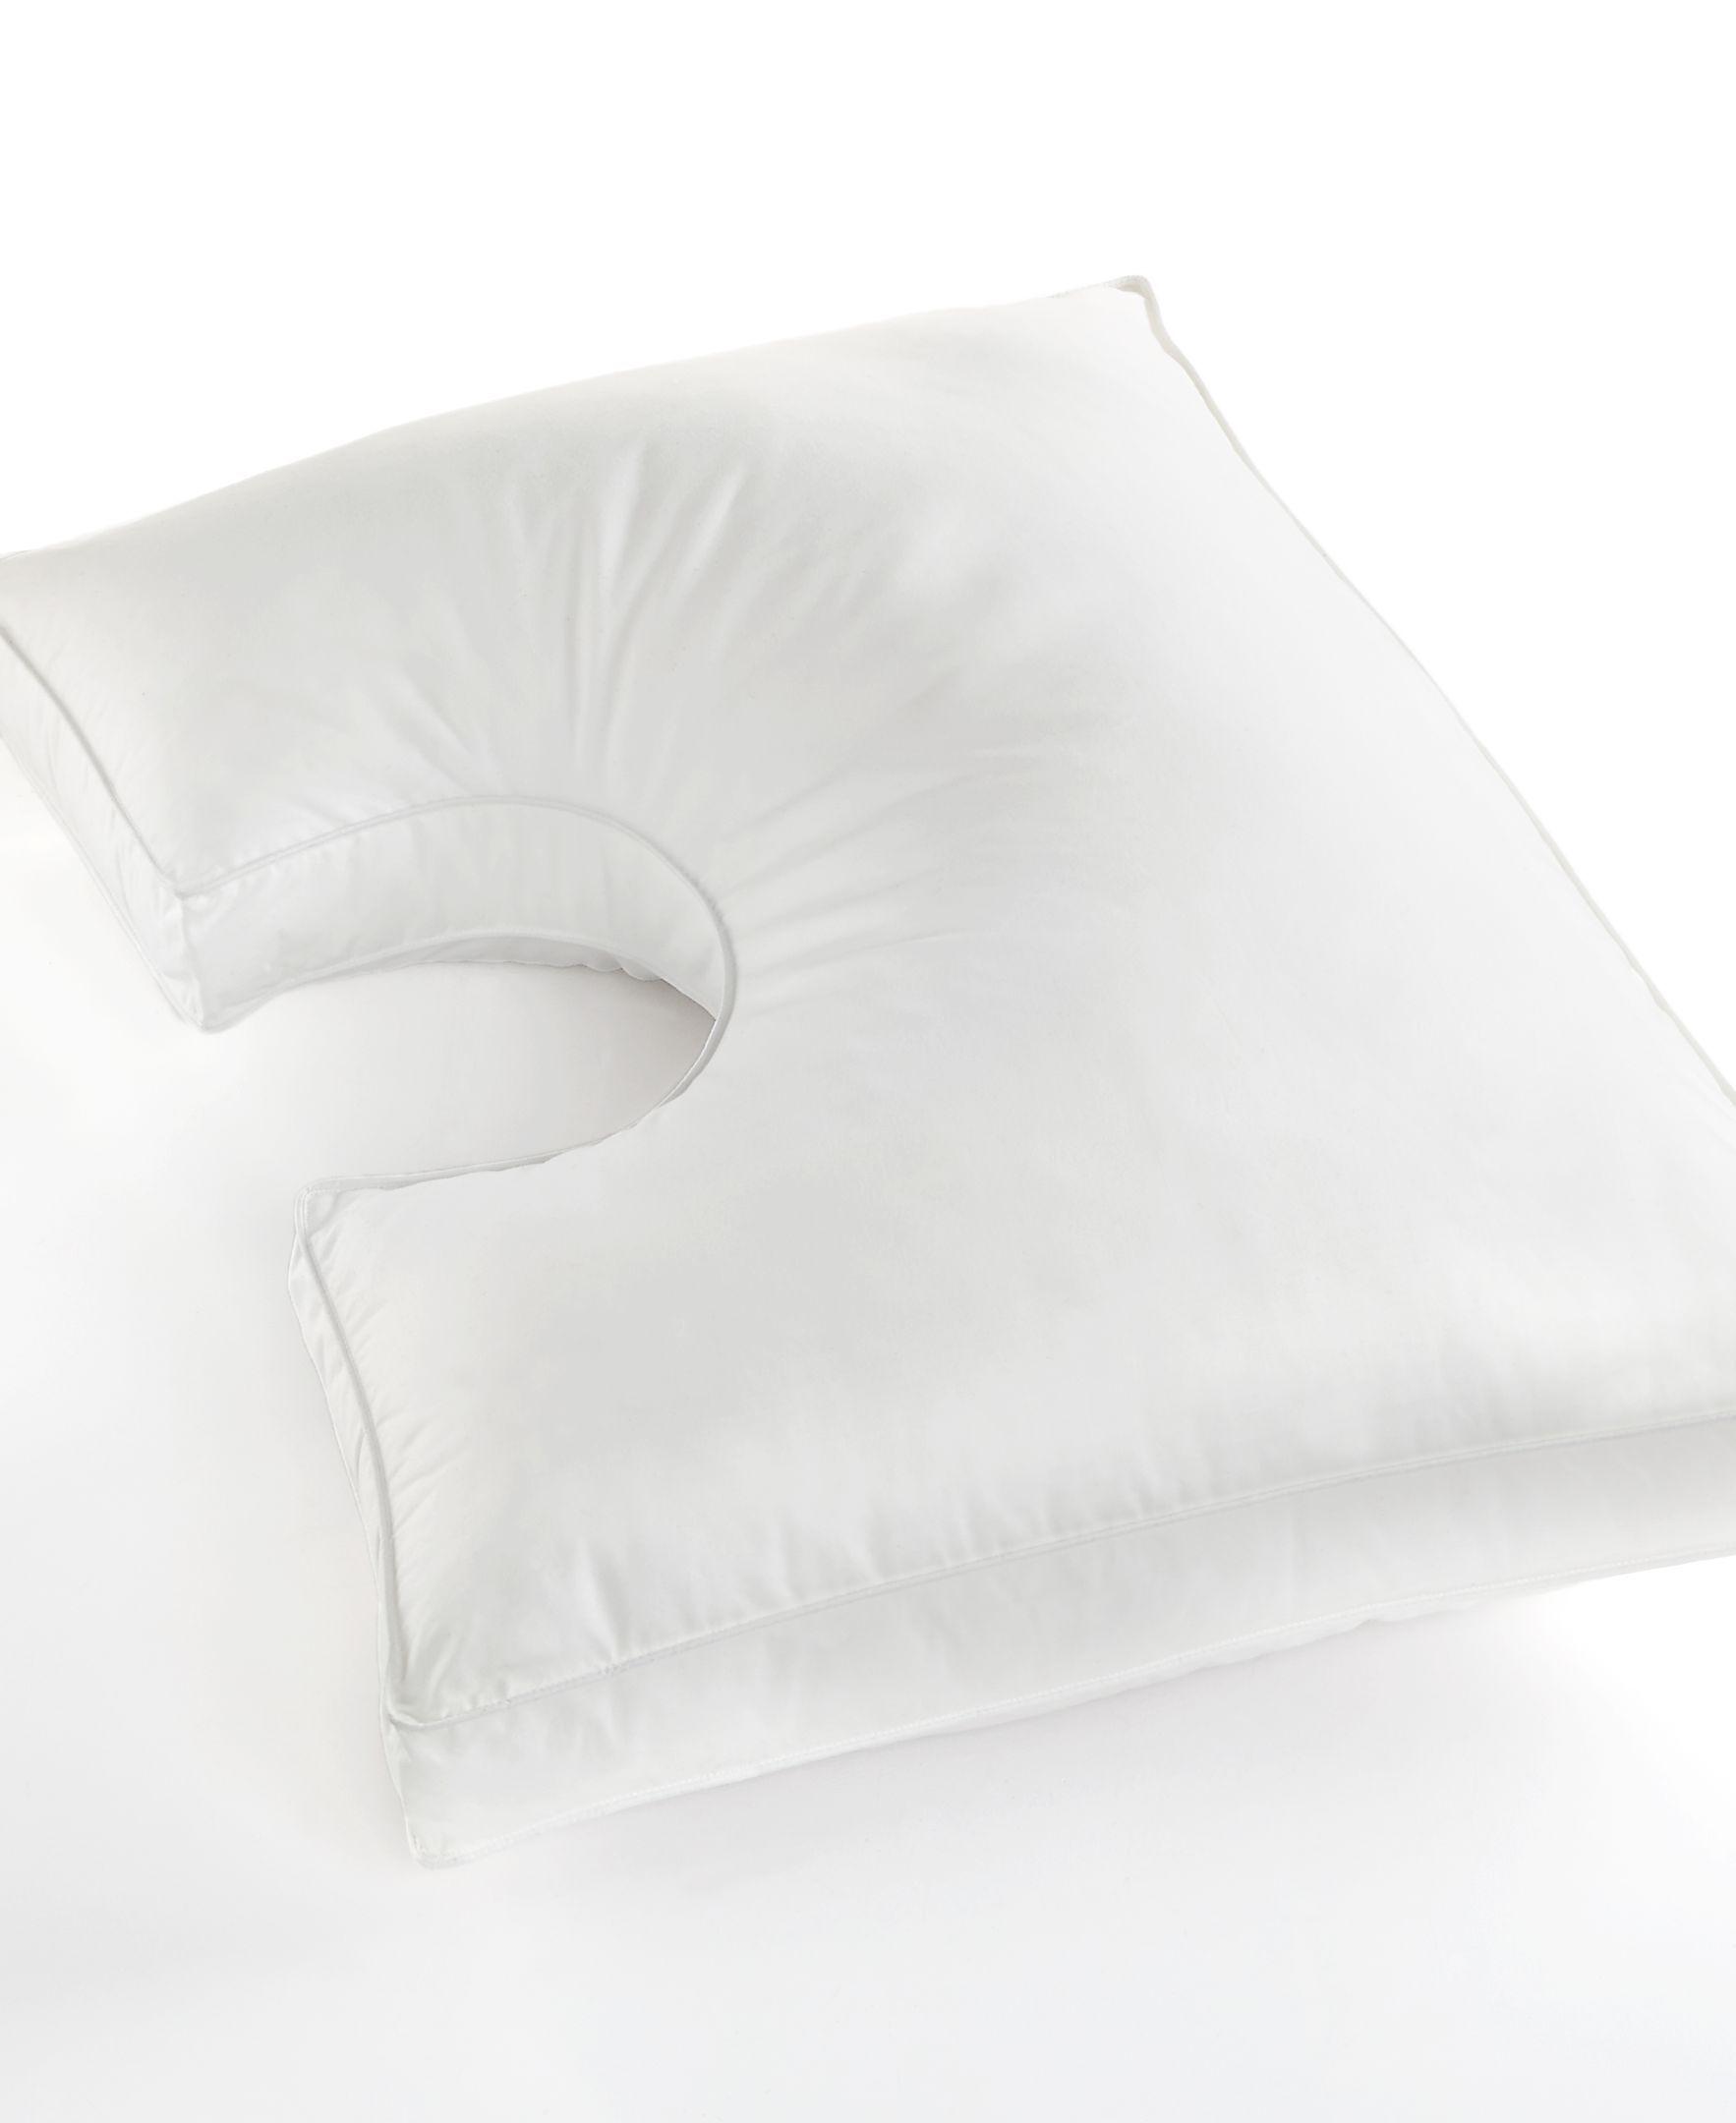 Encompass Memory Foam Travel Pillow